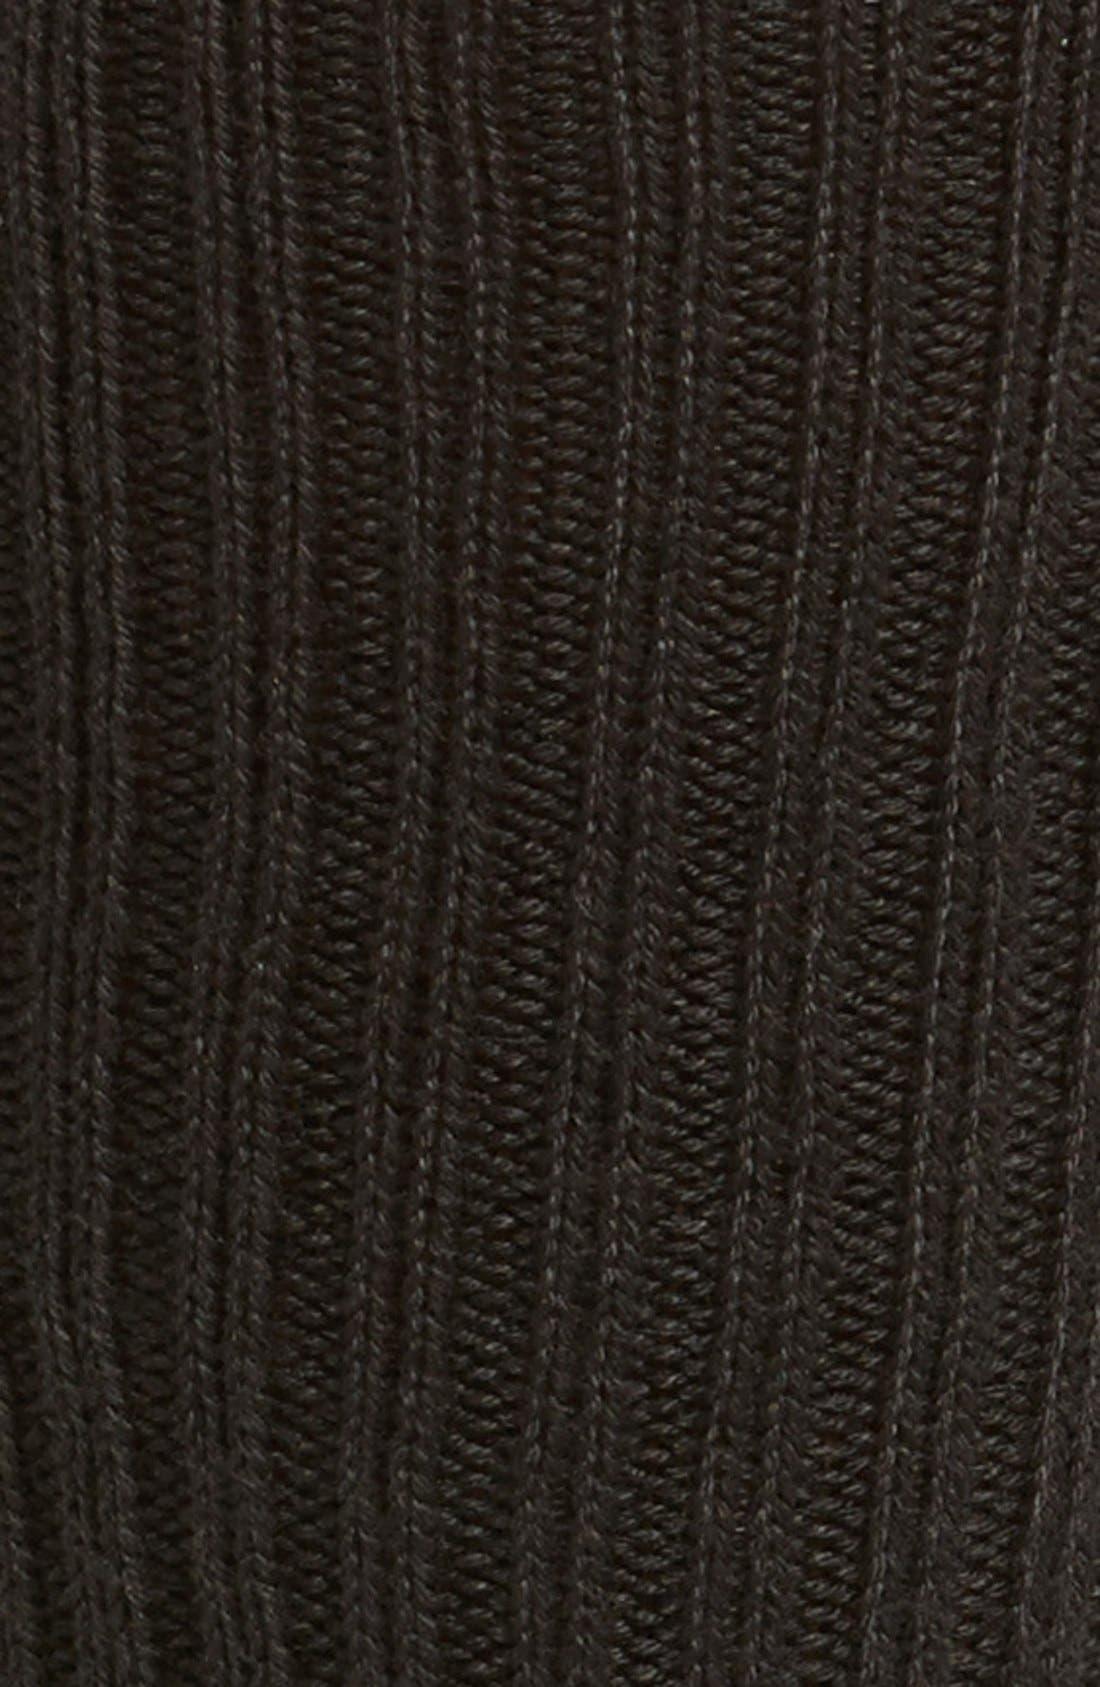 3-Pack Casual Socks,                             Alternate thumbnail 2, color,                             BLACK